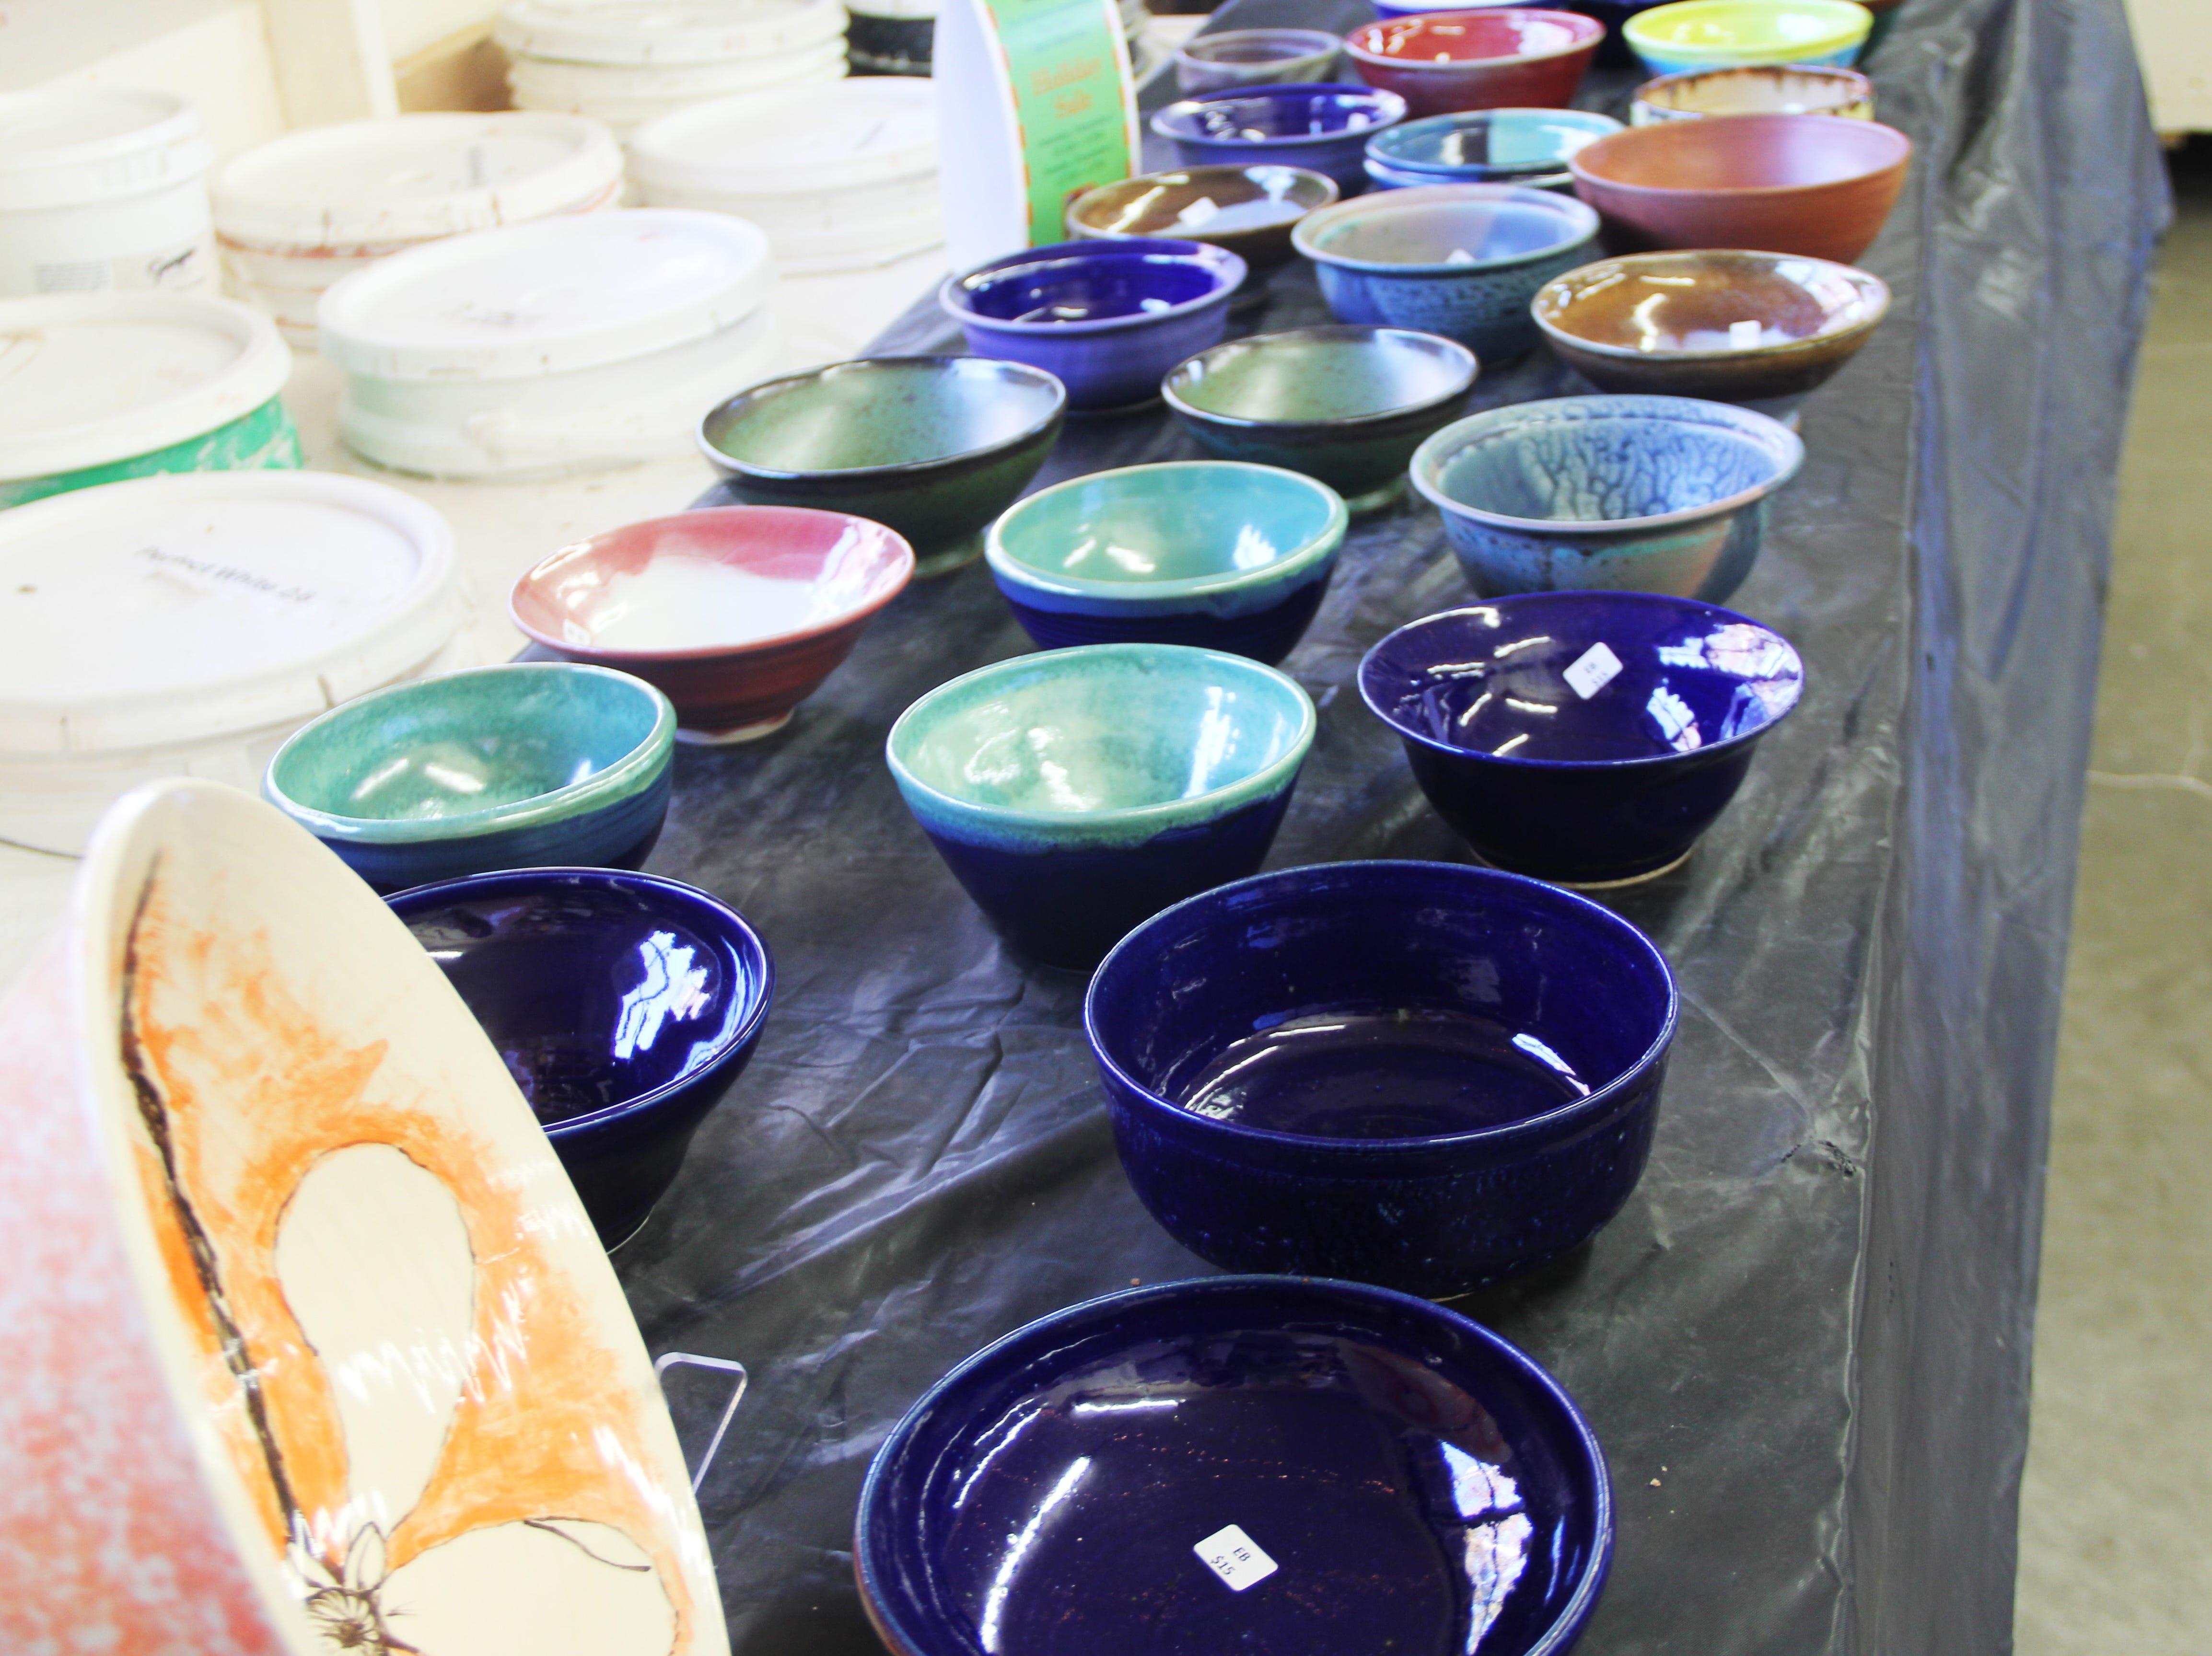 PHOTO: A look inside Willamette Art Center's Empty Bowls fundraiser